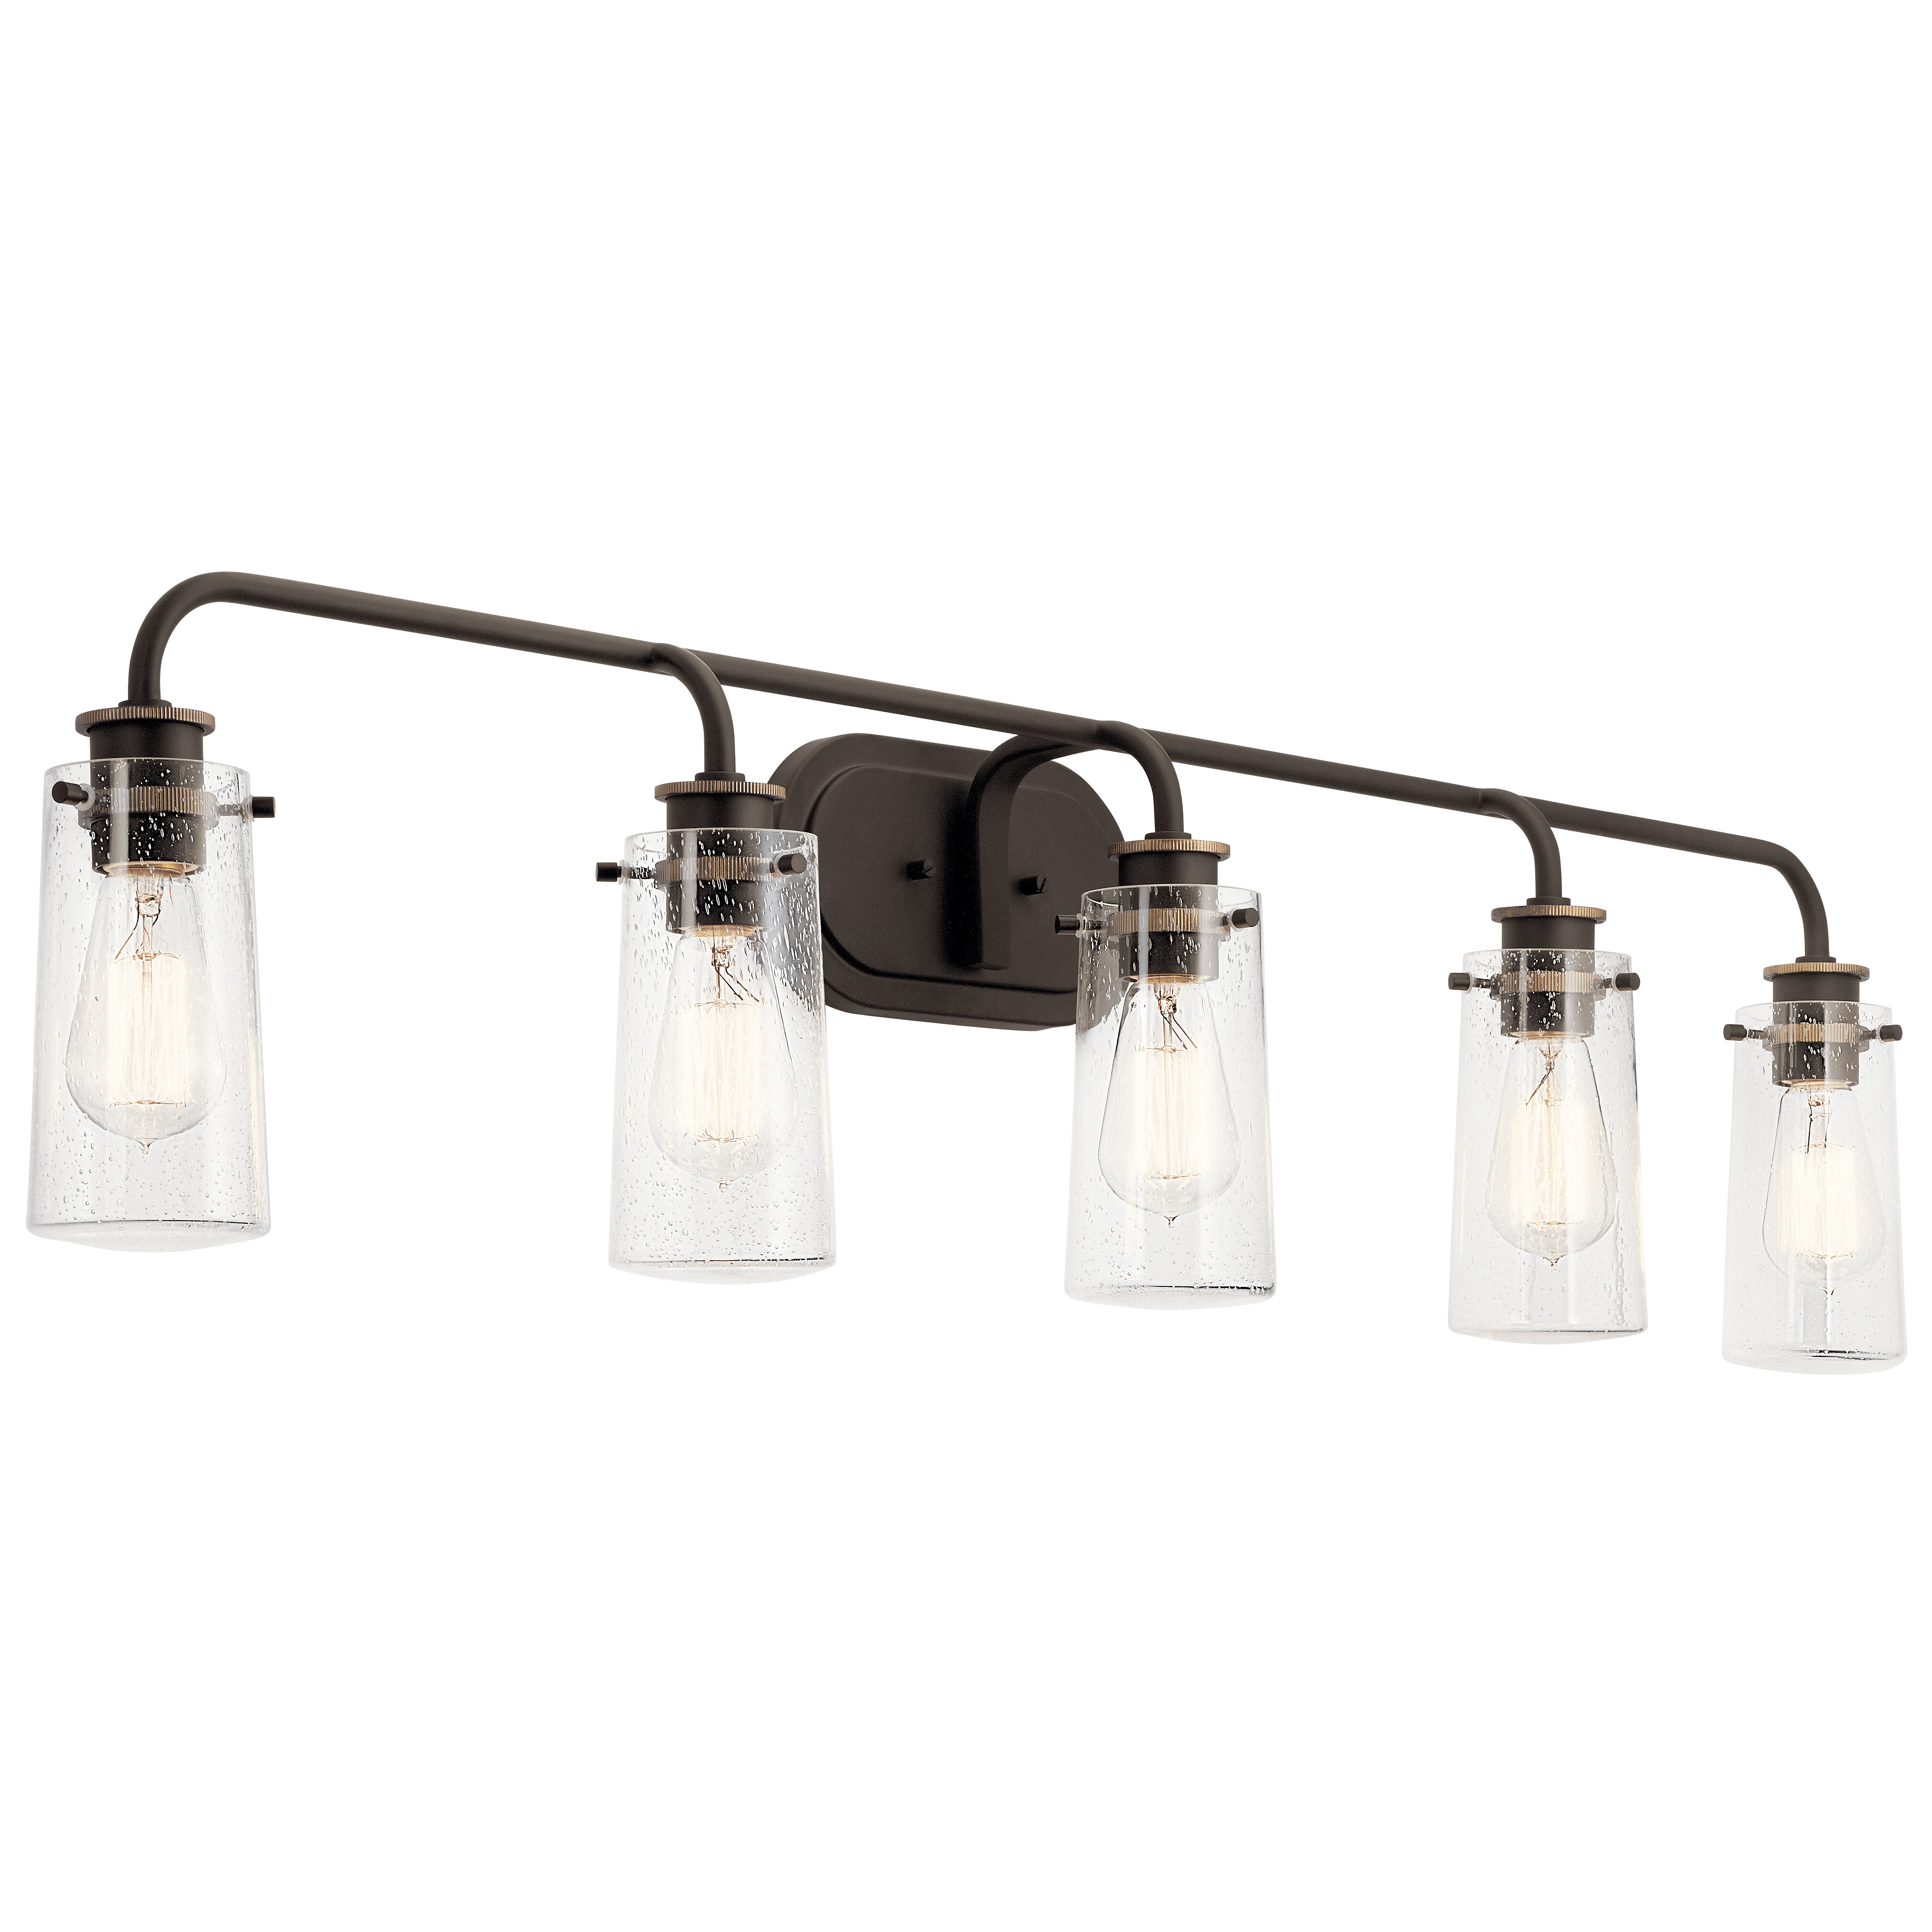 5 Light Vanity Light